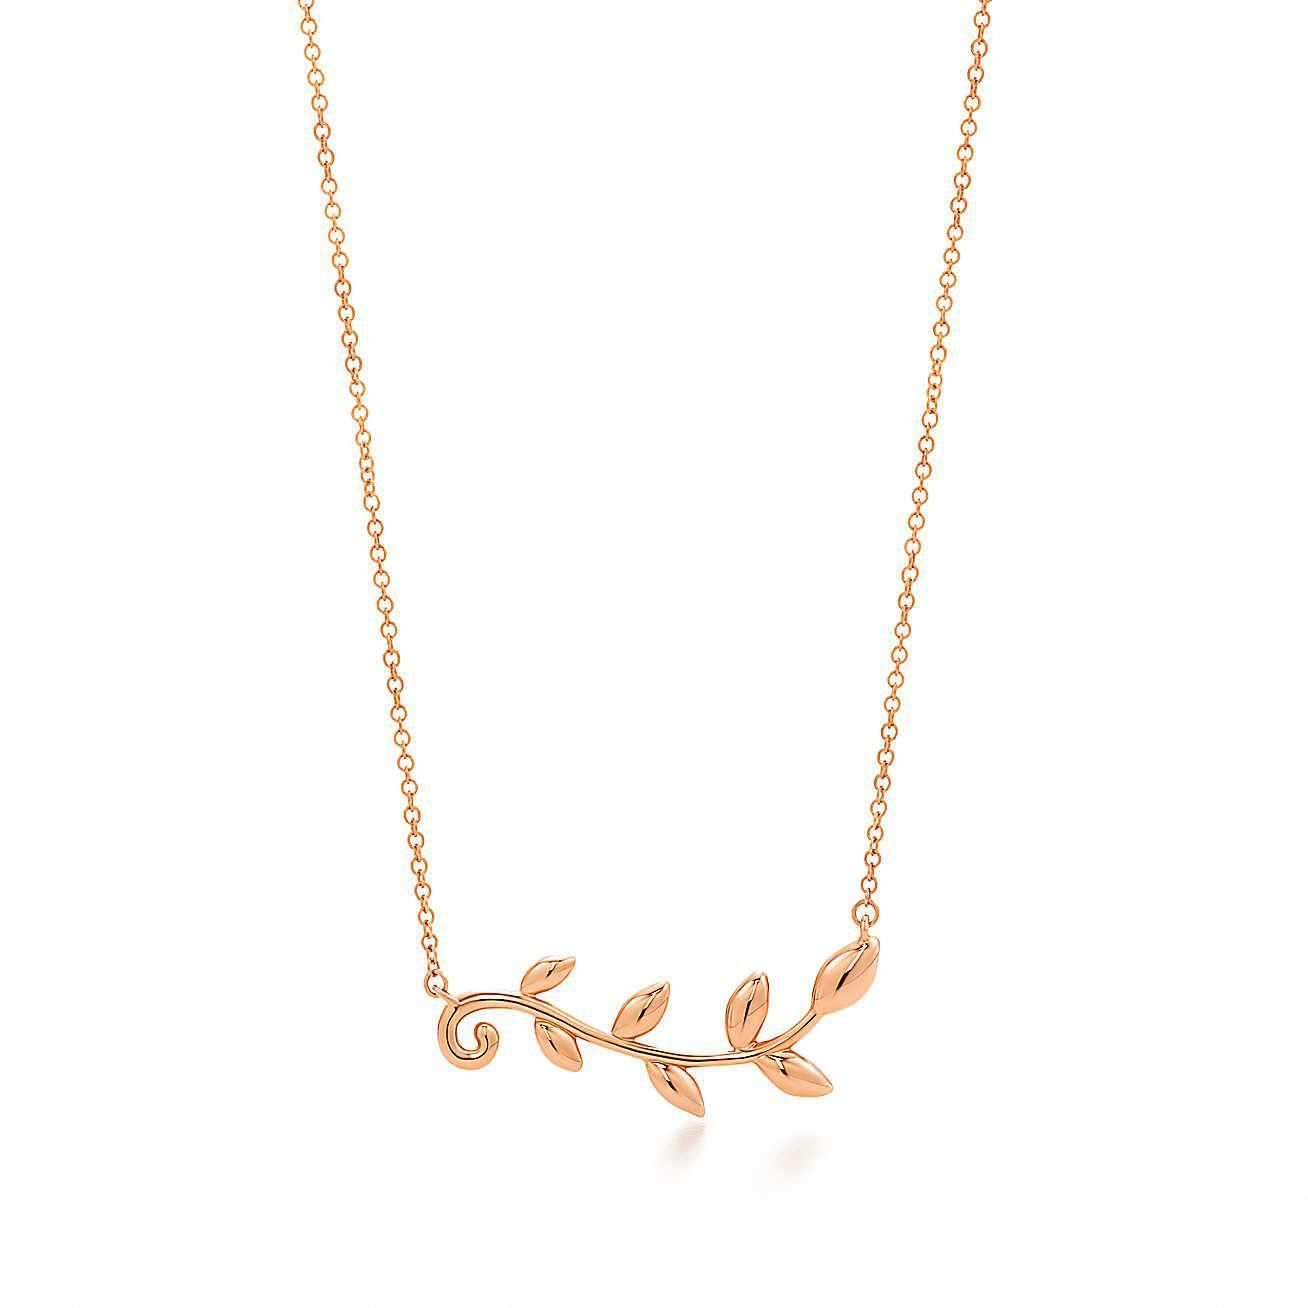 8207f0371 Paloma Picasso®:Olive Leaf Vine Pendant #tiffanyjewelry   Tiffany ...